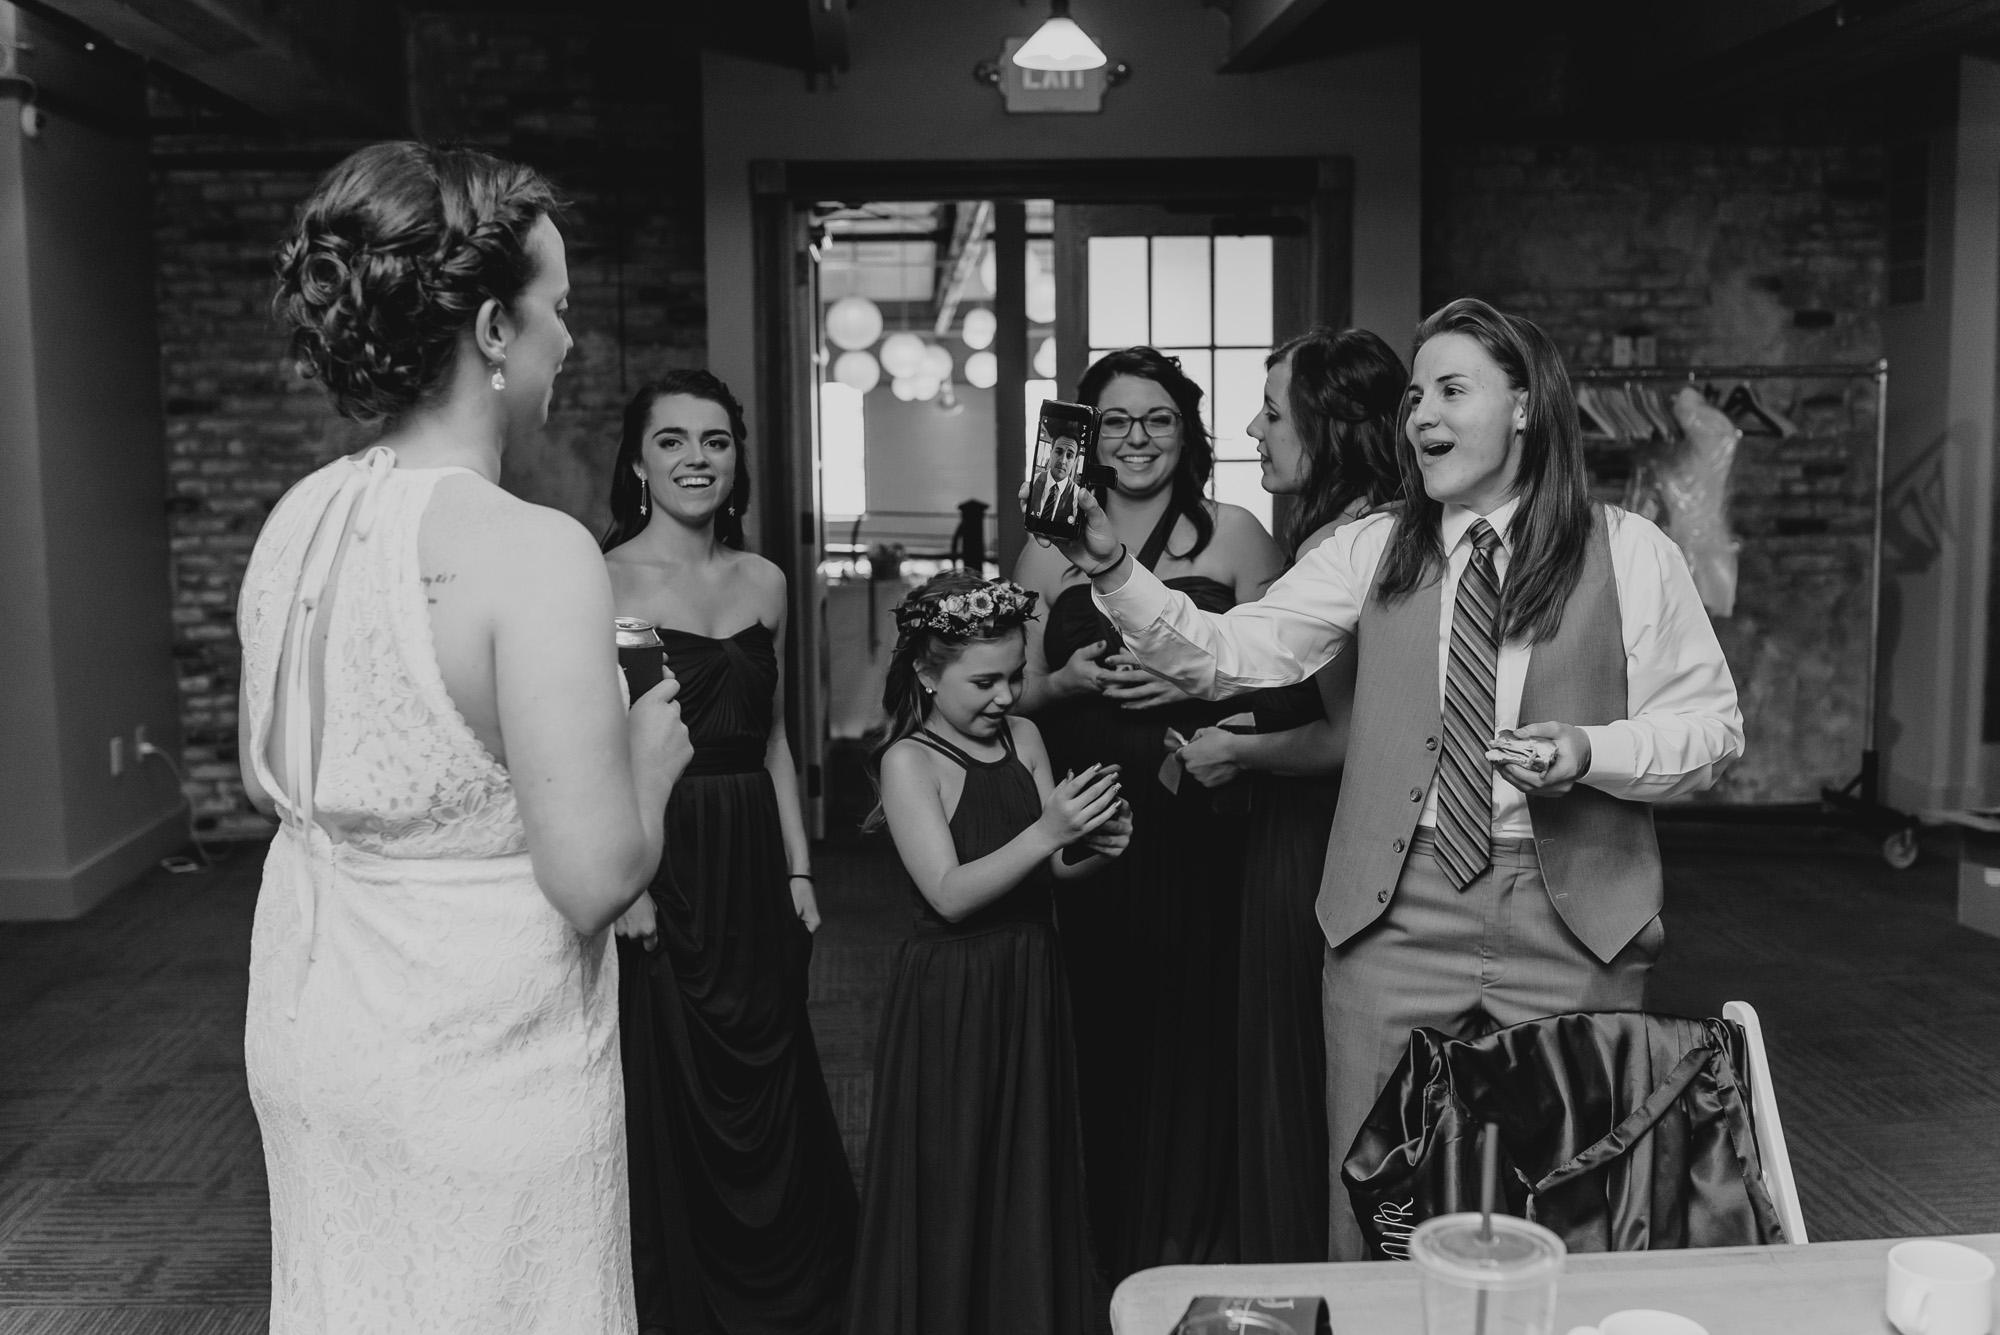 prairie-street-brewhouse-wedding-Rockford-IL-wedding-photographers-34.jpg